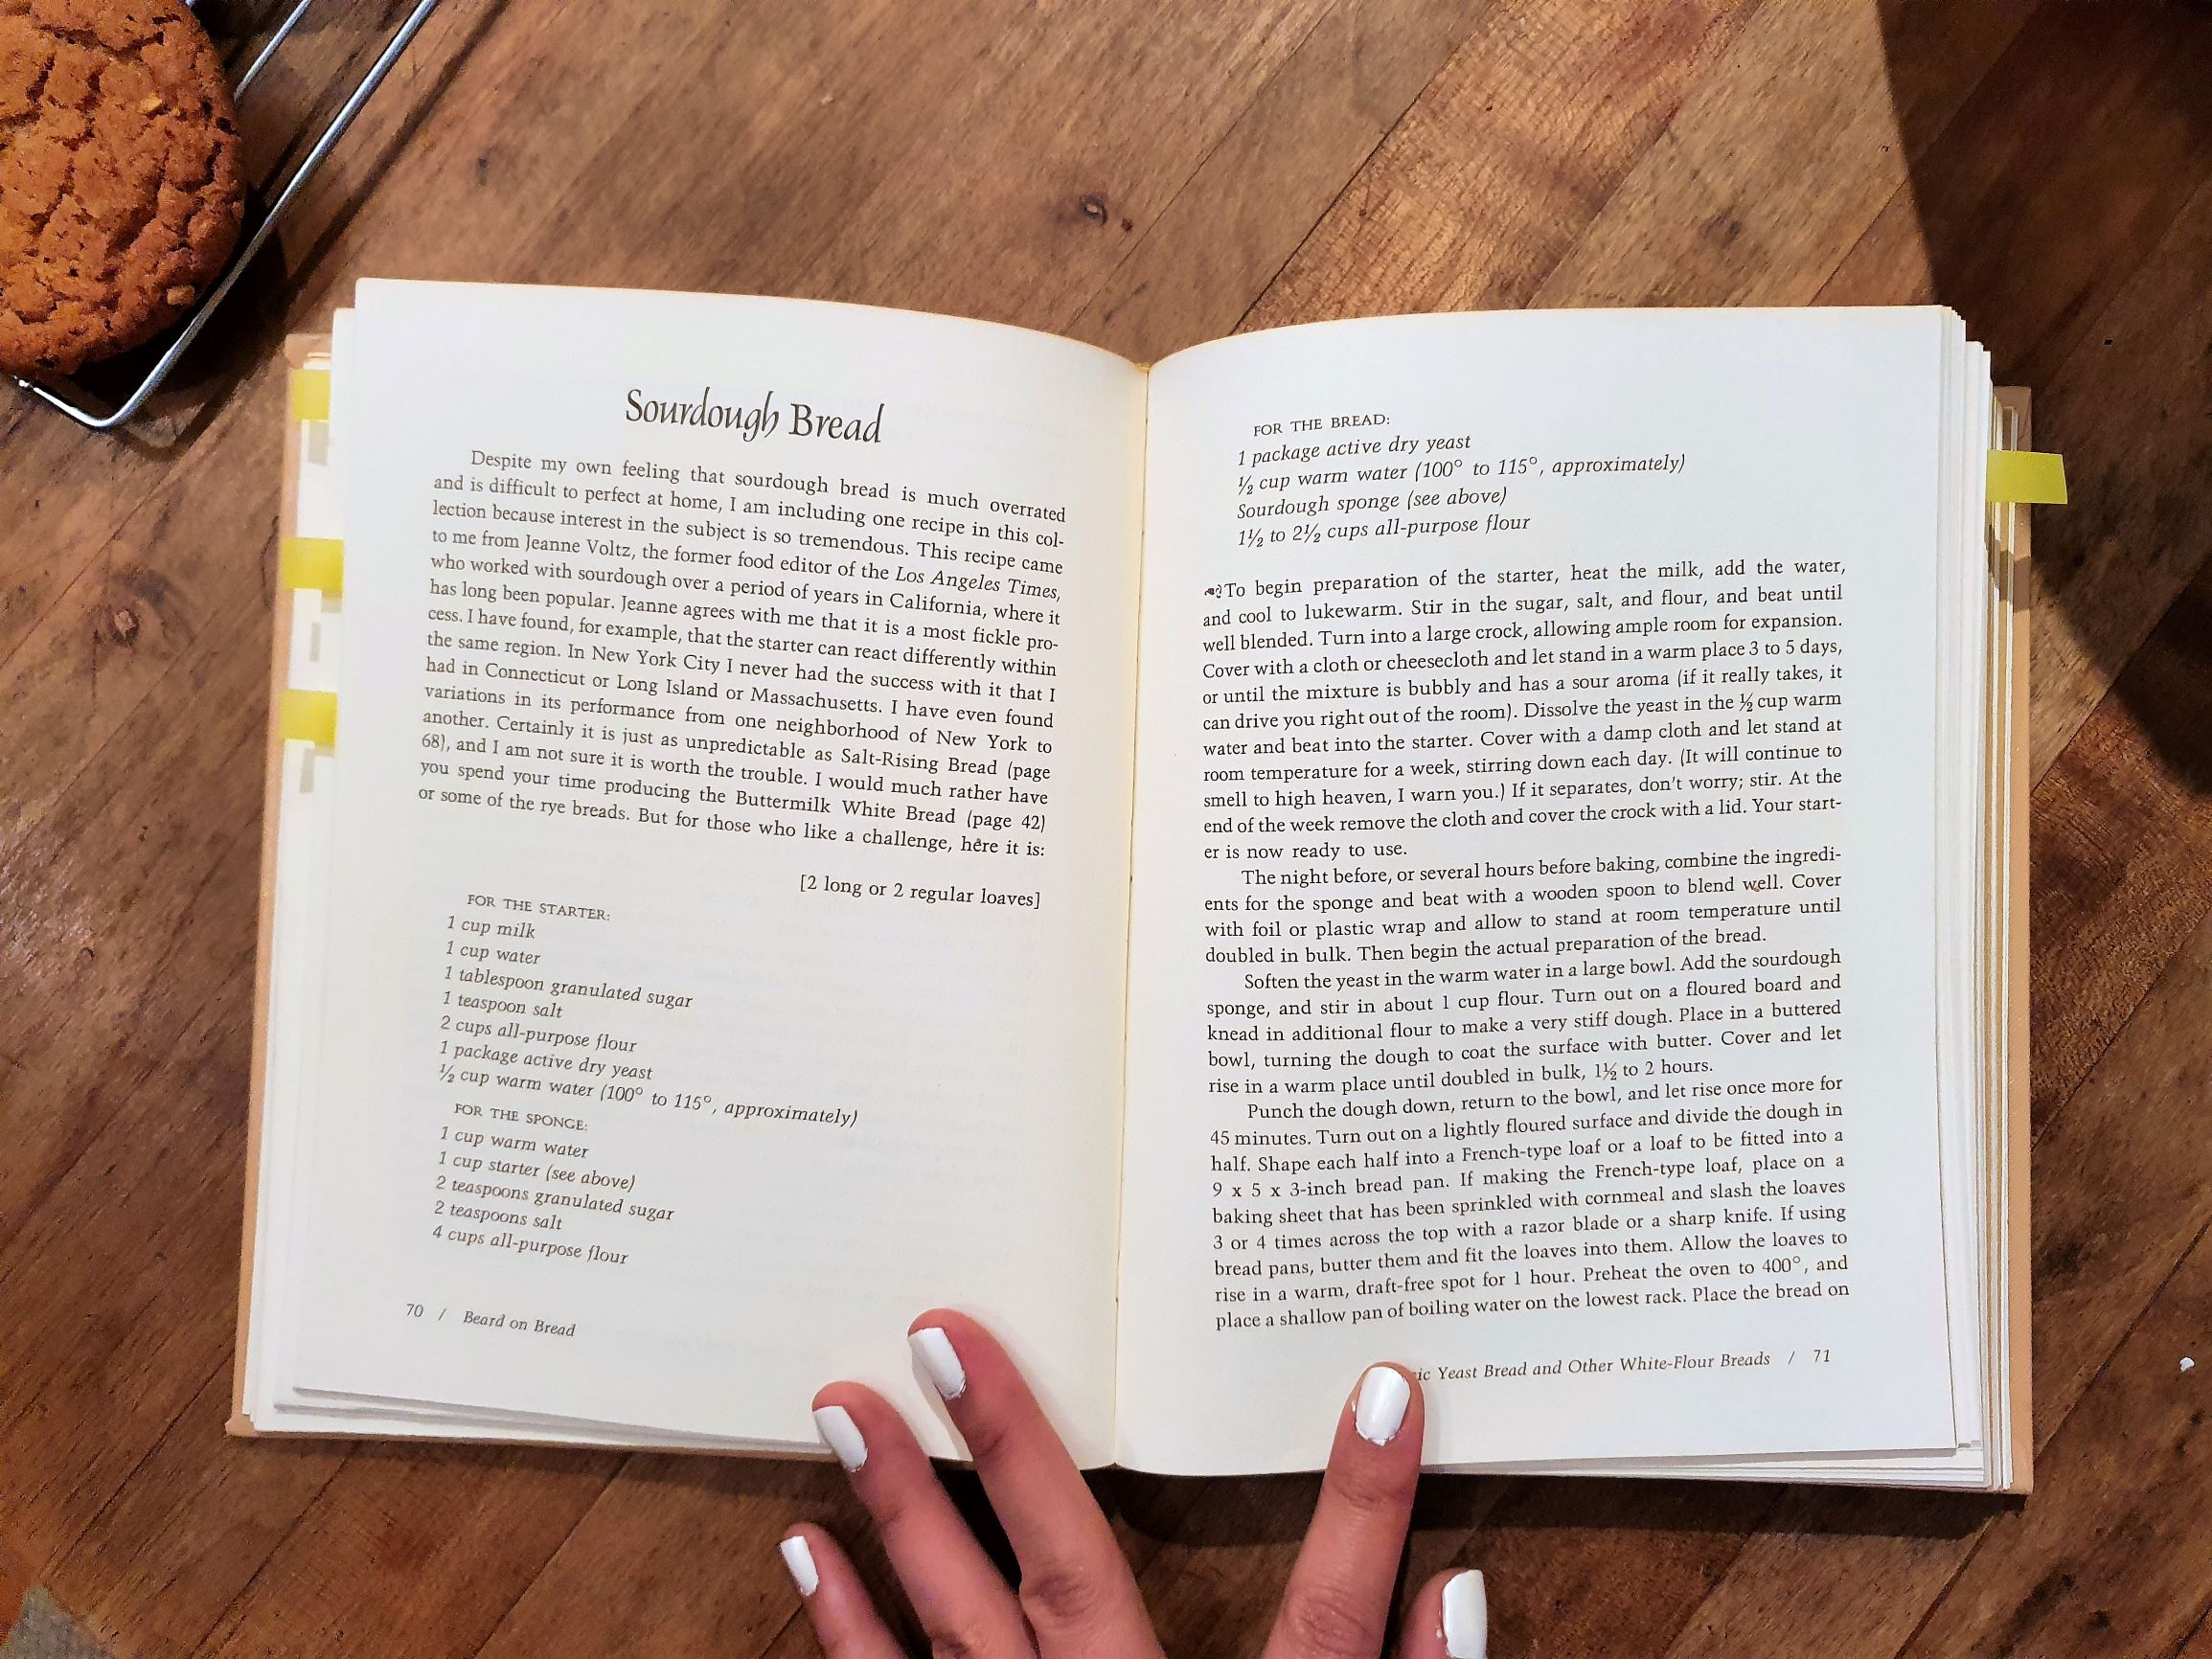 James Beard's Sourdough Bread recipe from his book Beard on Bread.